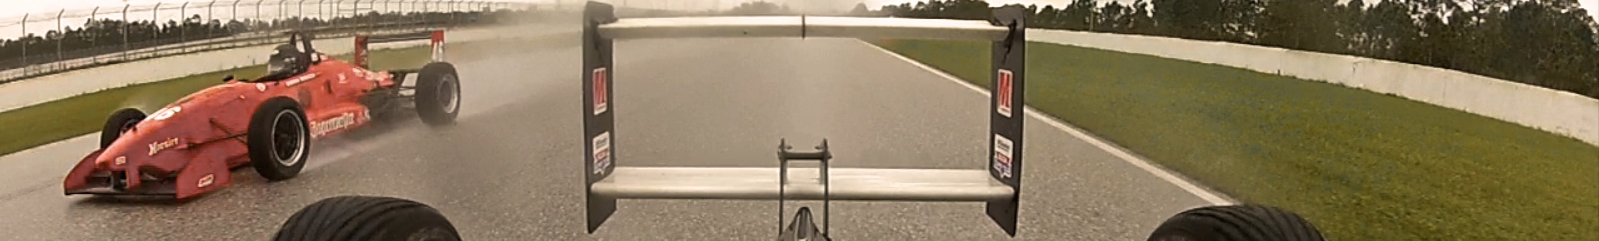 2014-01-PBIR-SCCA-04-QUAL2-Rear-wet-7.jpg